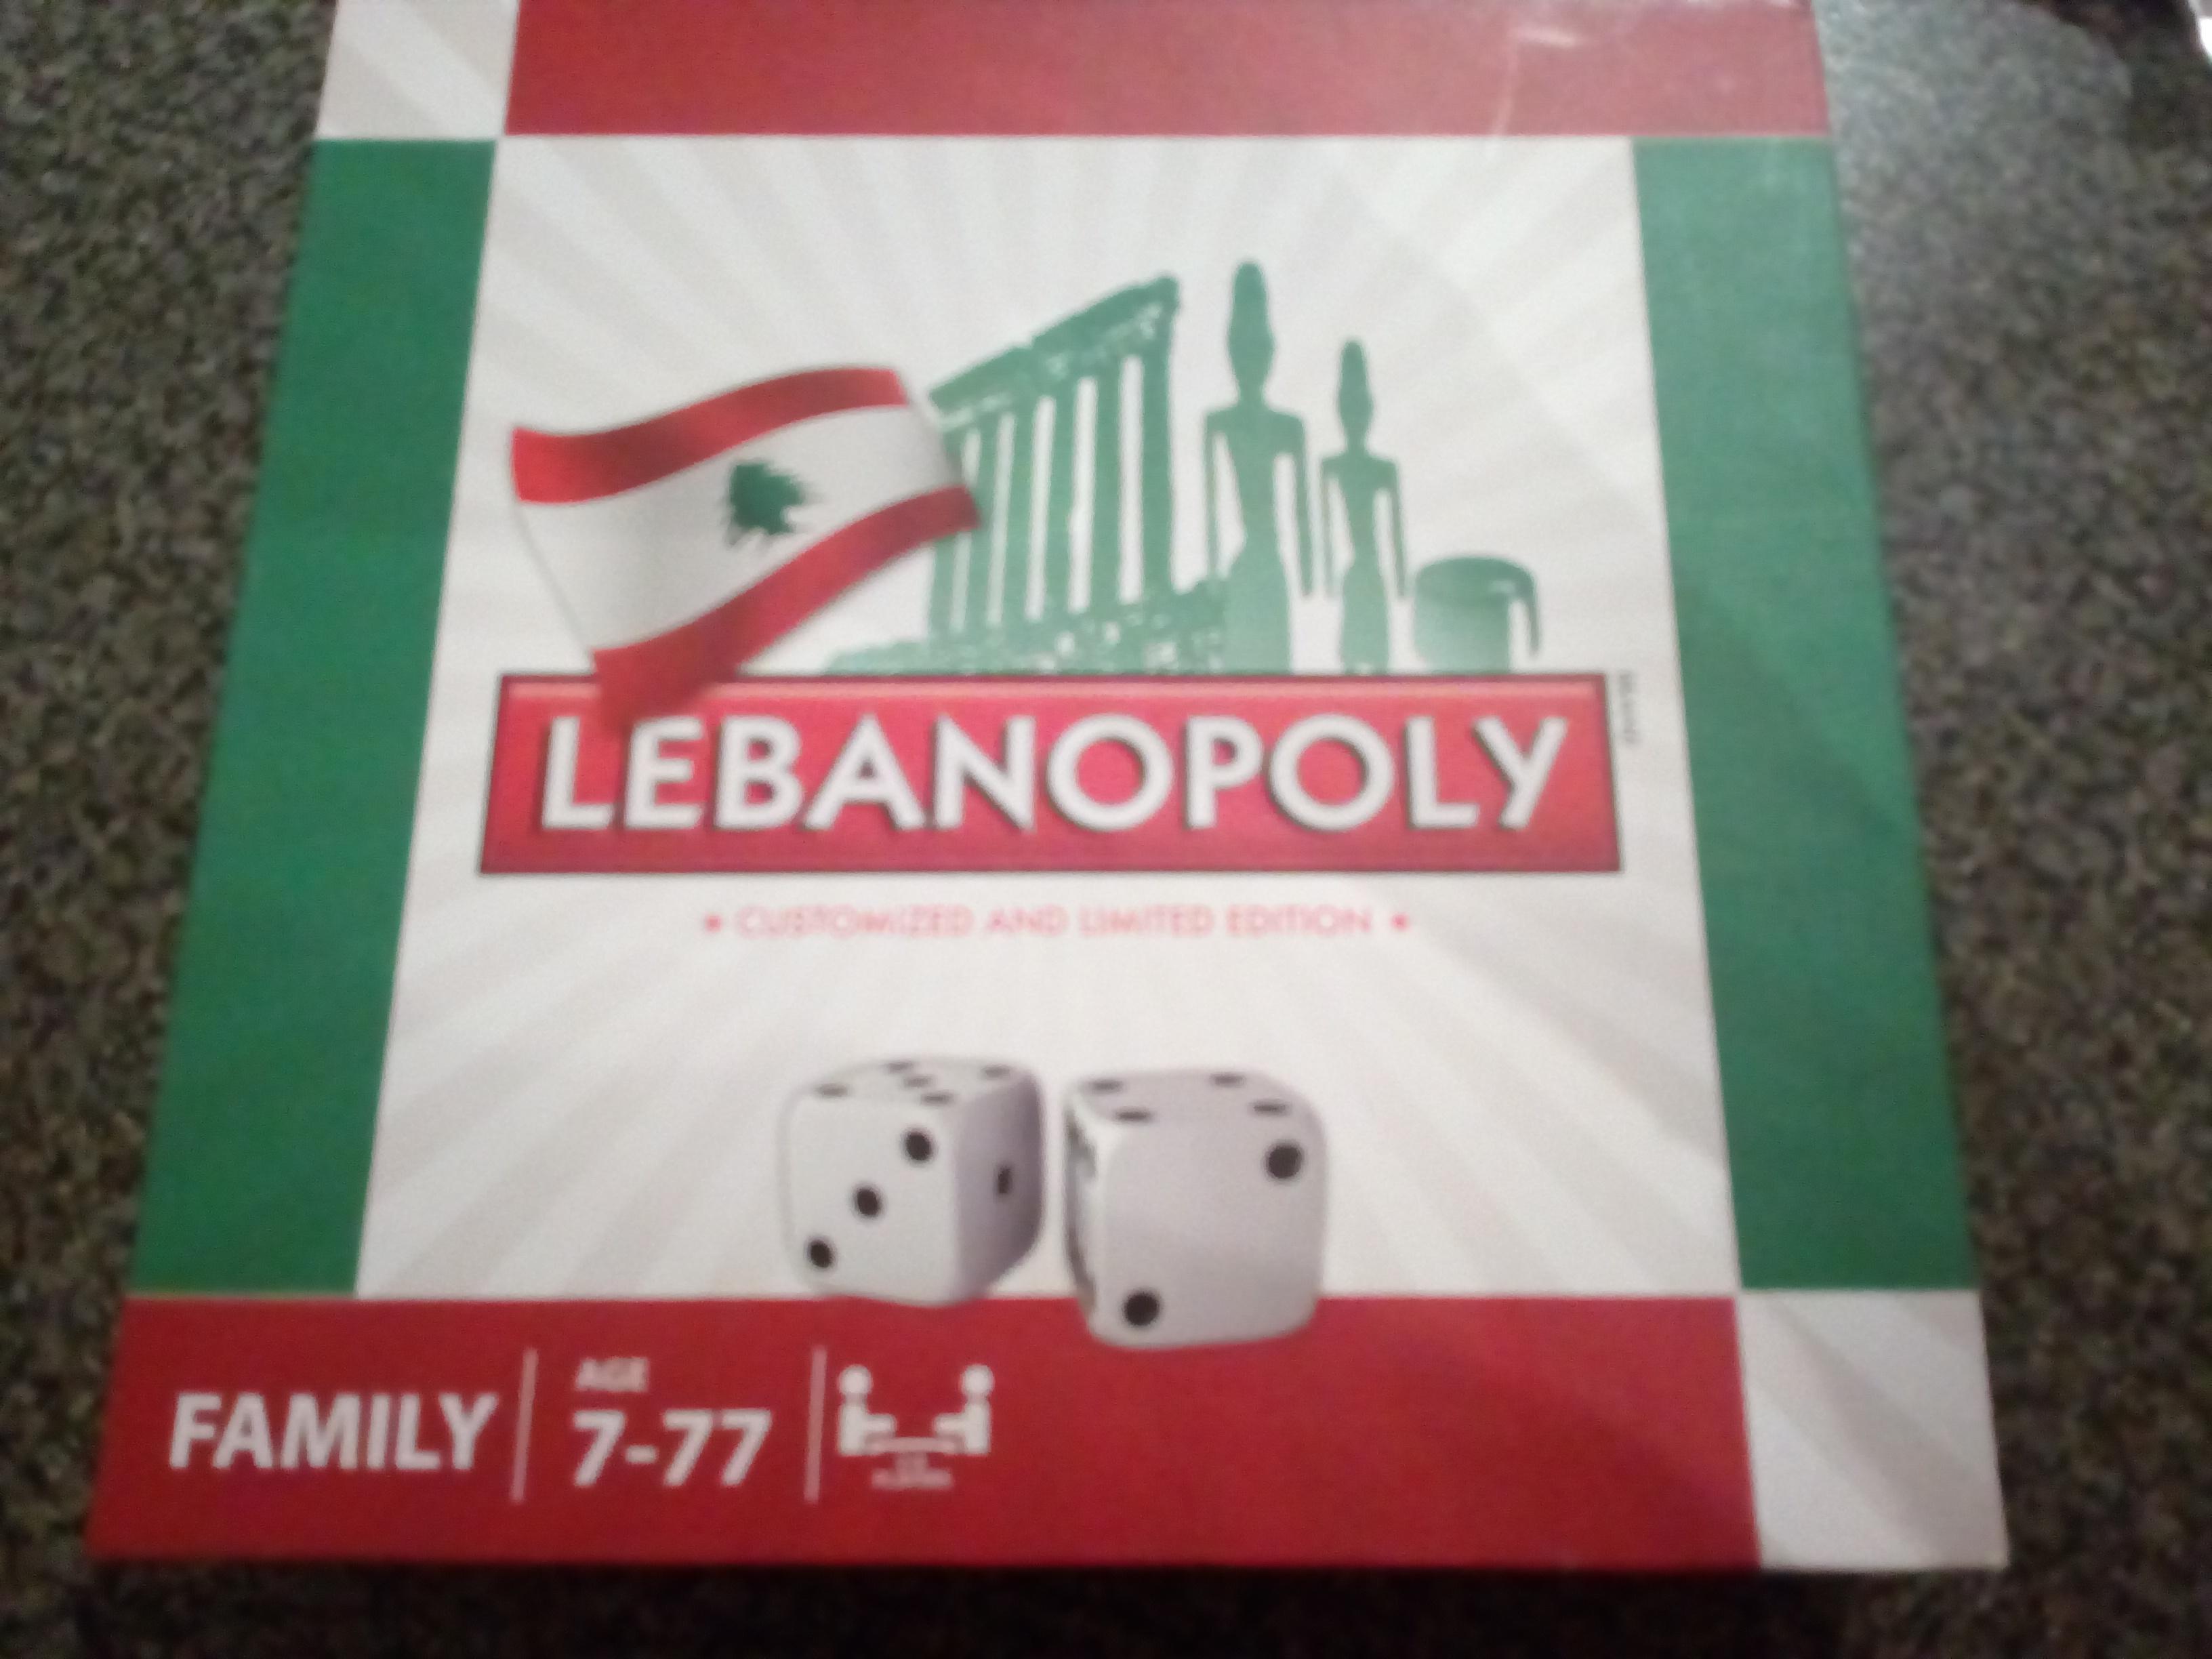 LEBANOPOLY